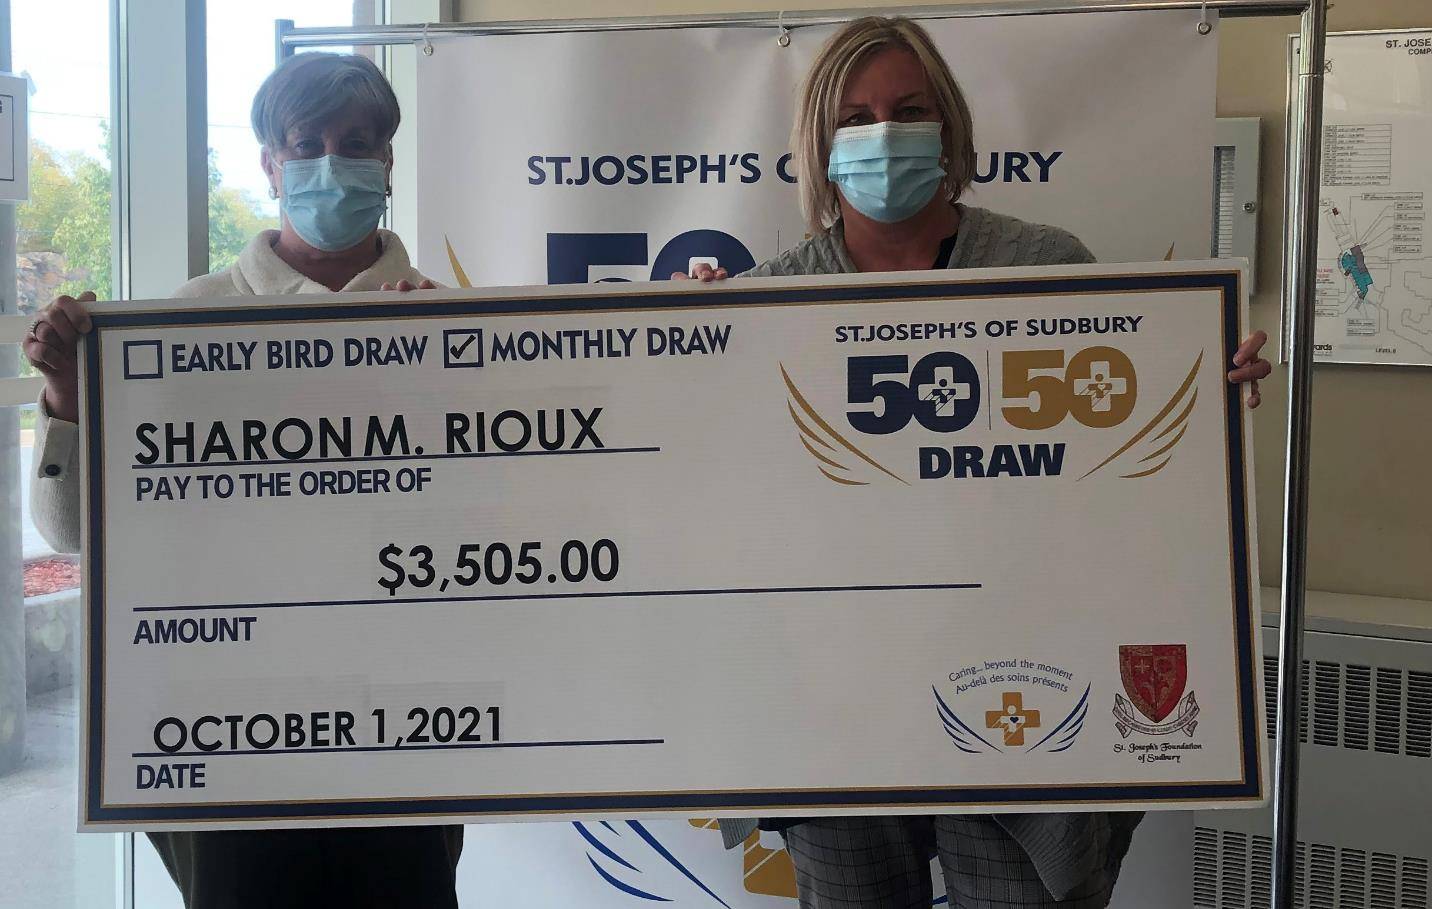 Sharon Rioux wins 50 50 draw